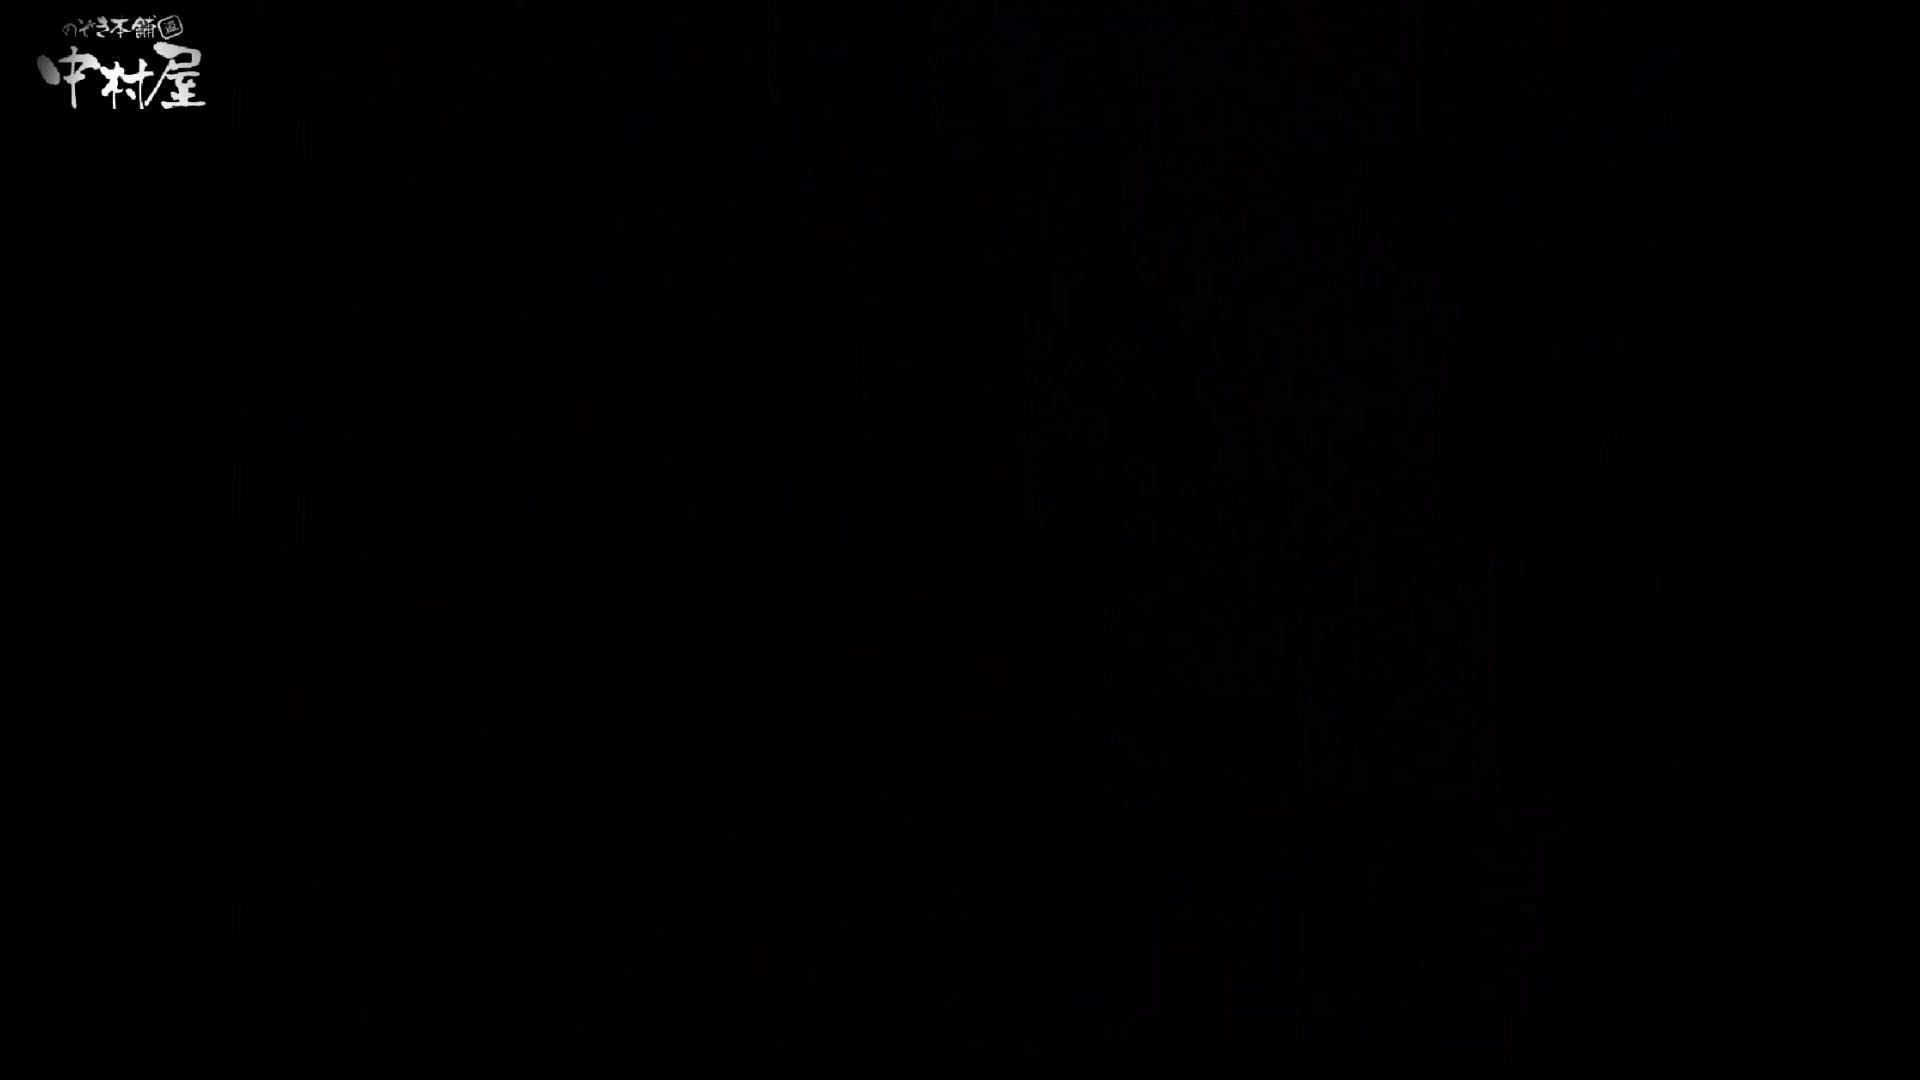 民家風呂専門盗撮師の超危険映像 vol.016 股間 えろ無修正画像 13pic 9